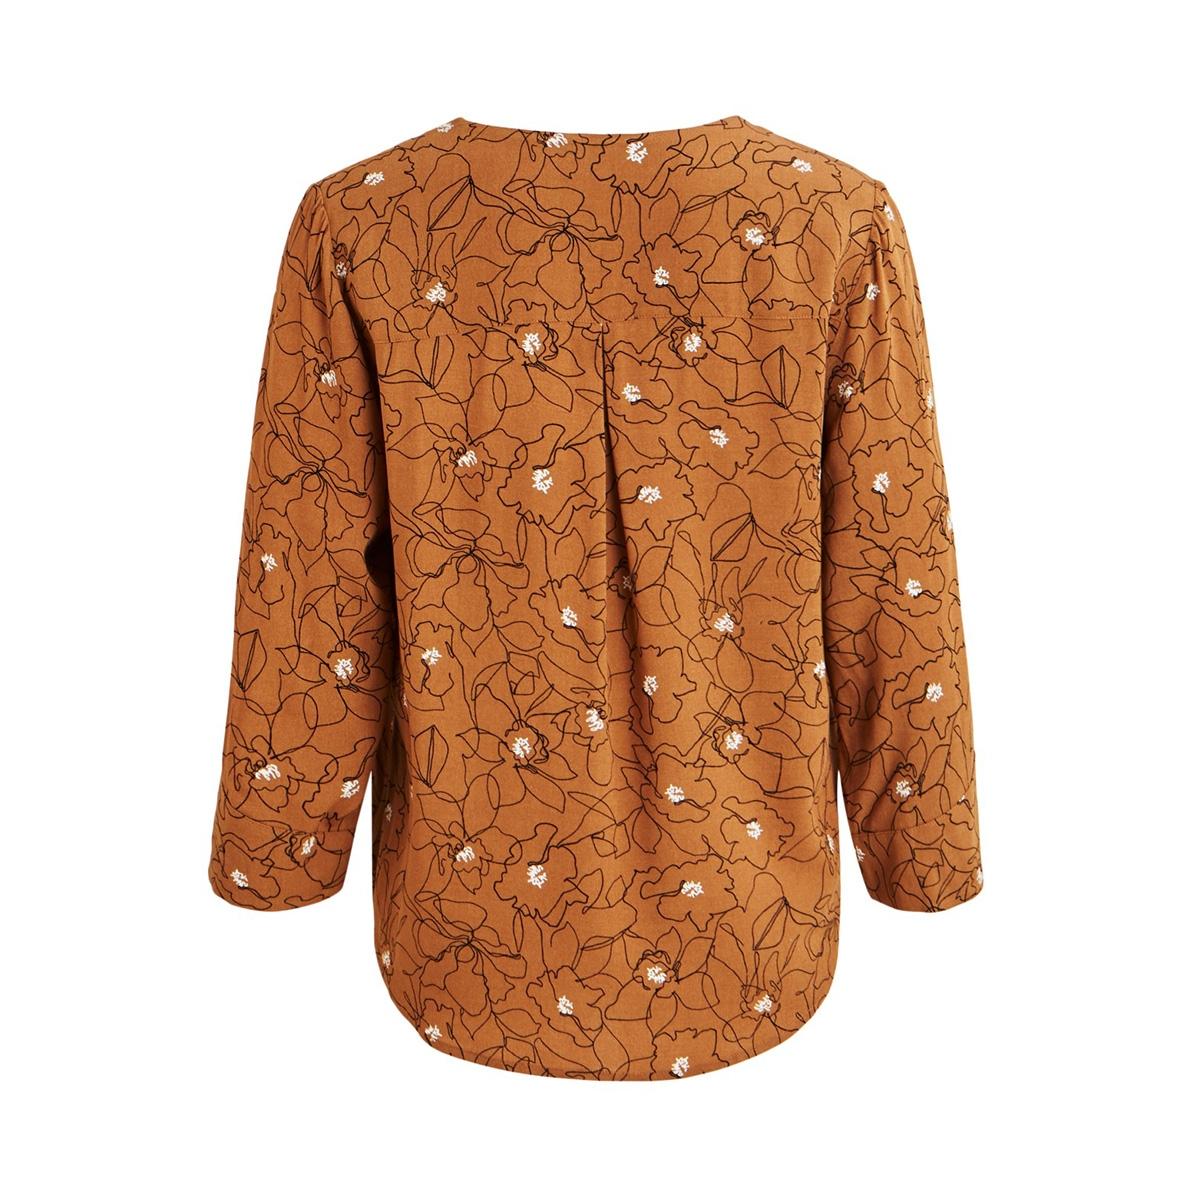 objbay 3/4 top aop seasonal 23028469 object t-shirt chipmunk/graphic fl